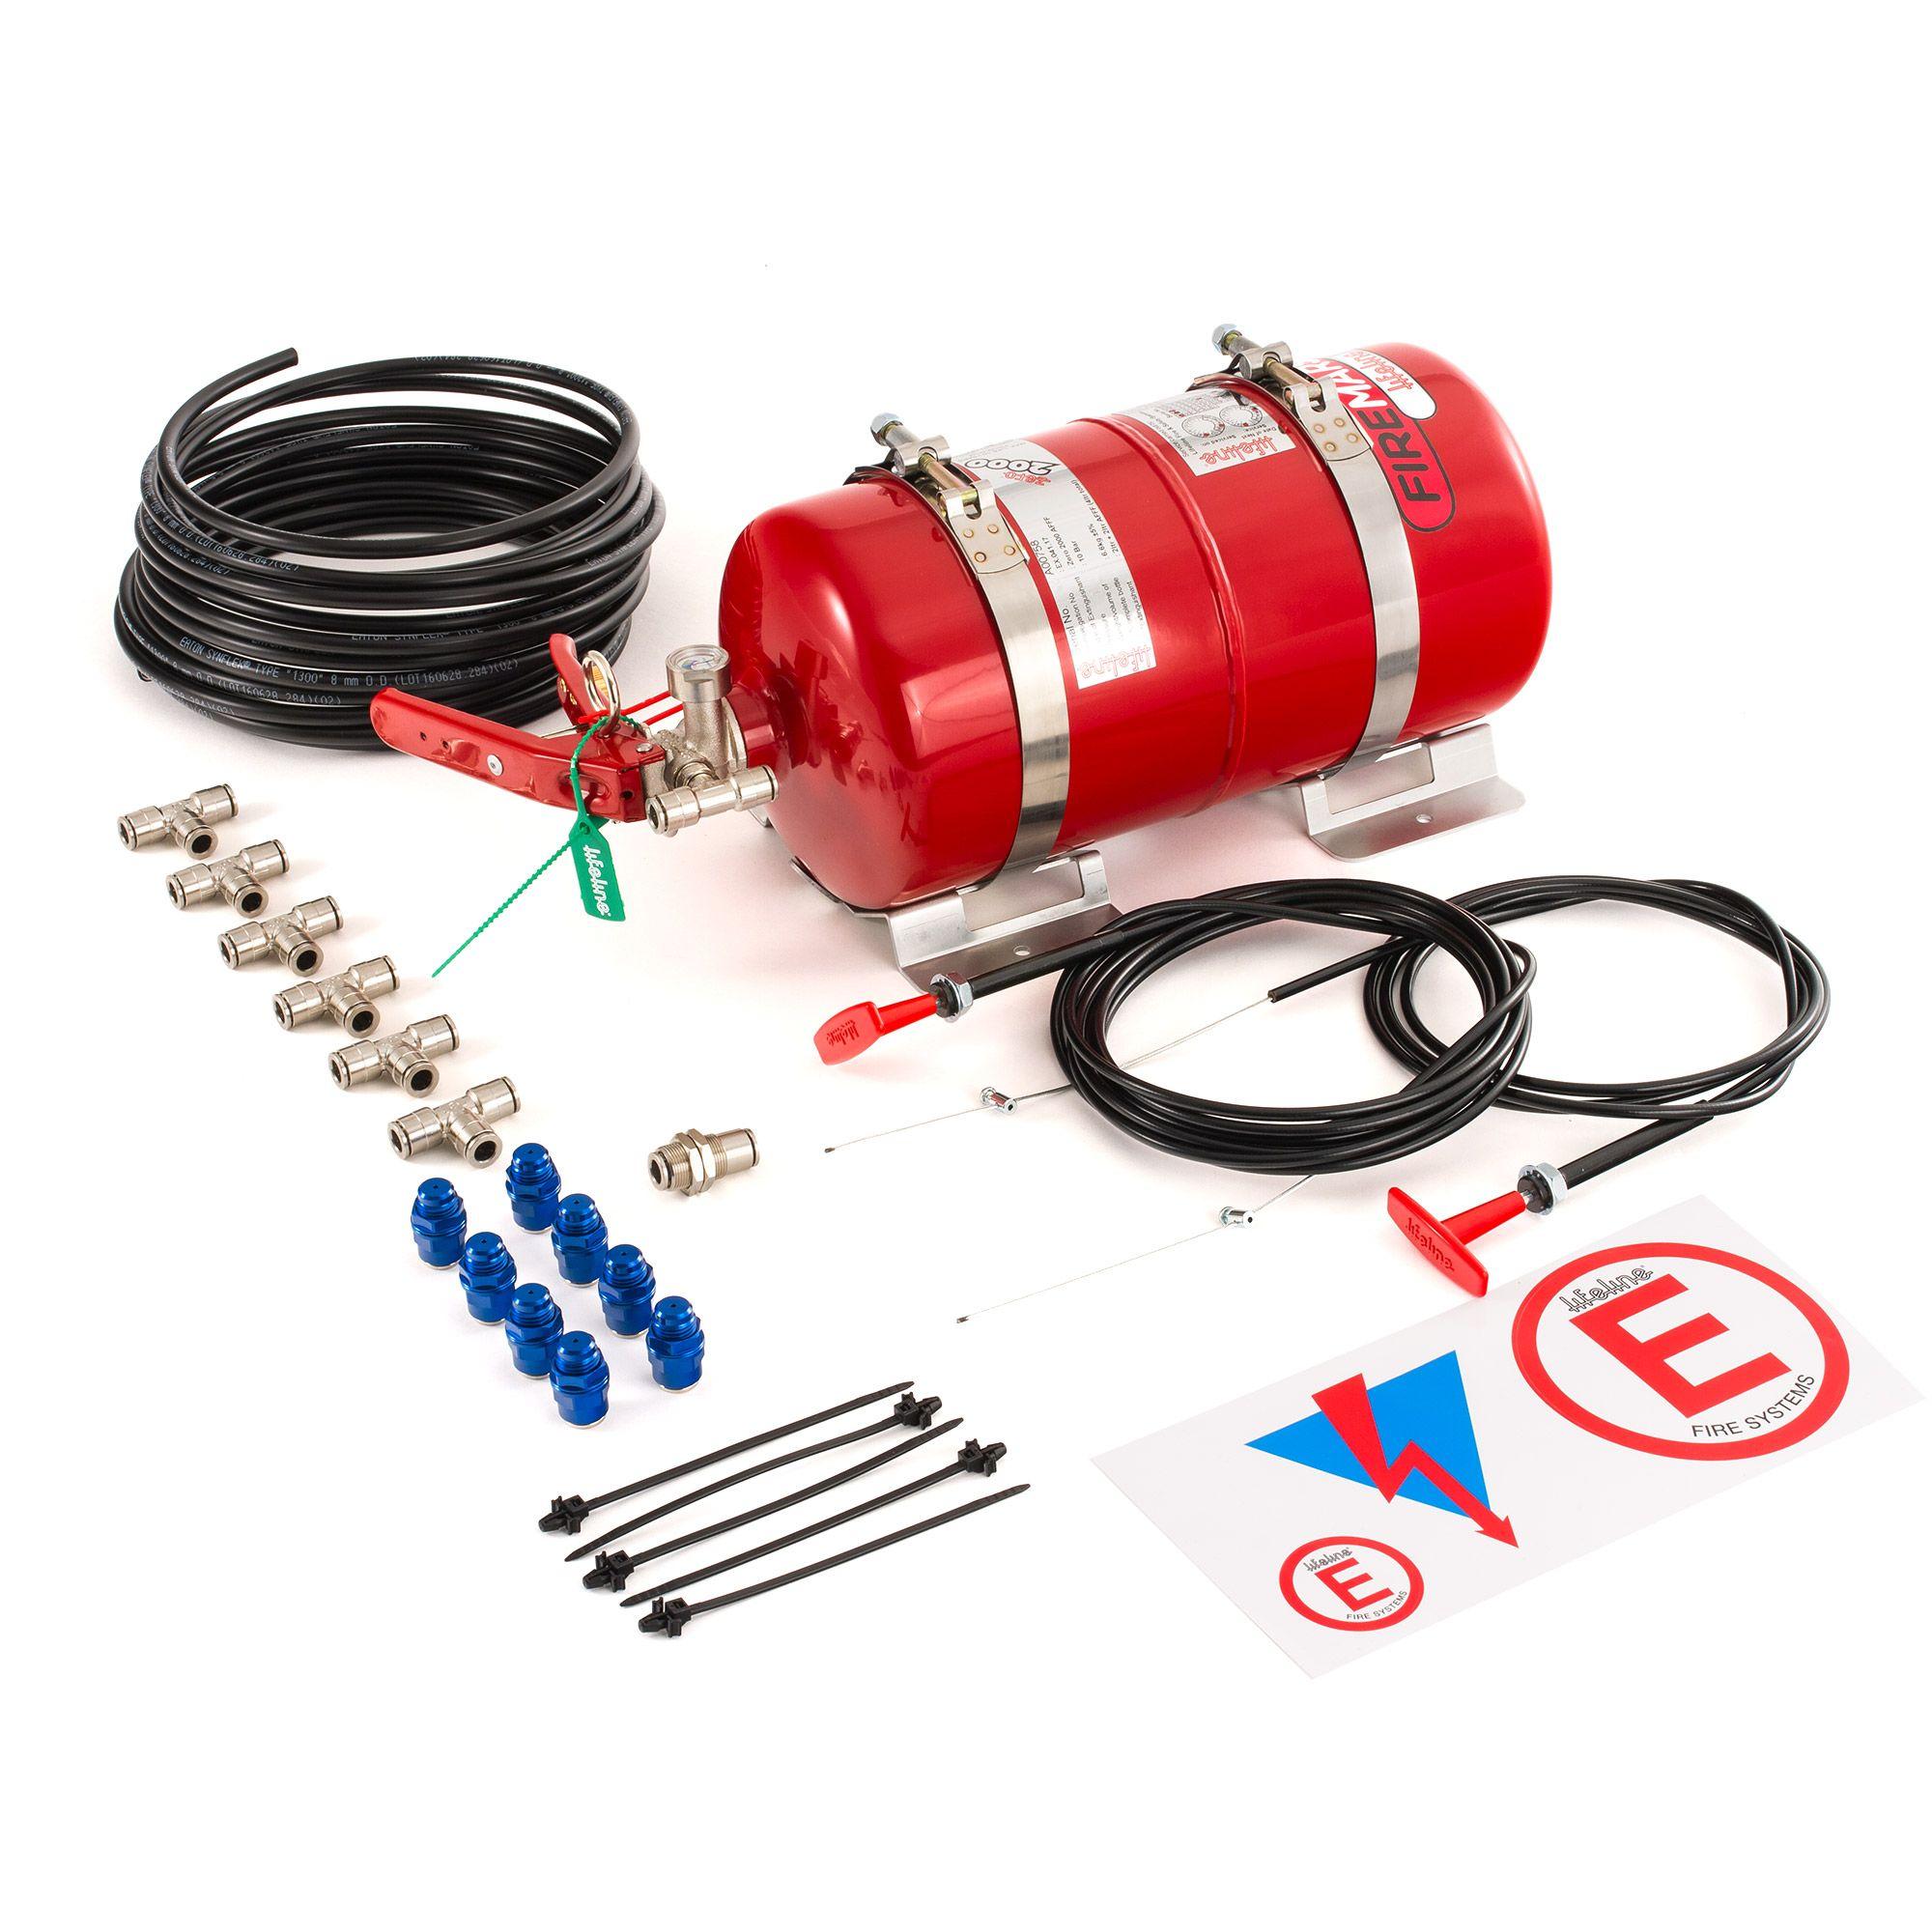 Fire Extinguisher Kits